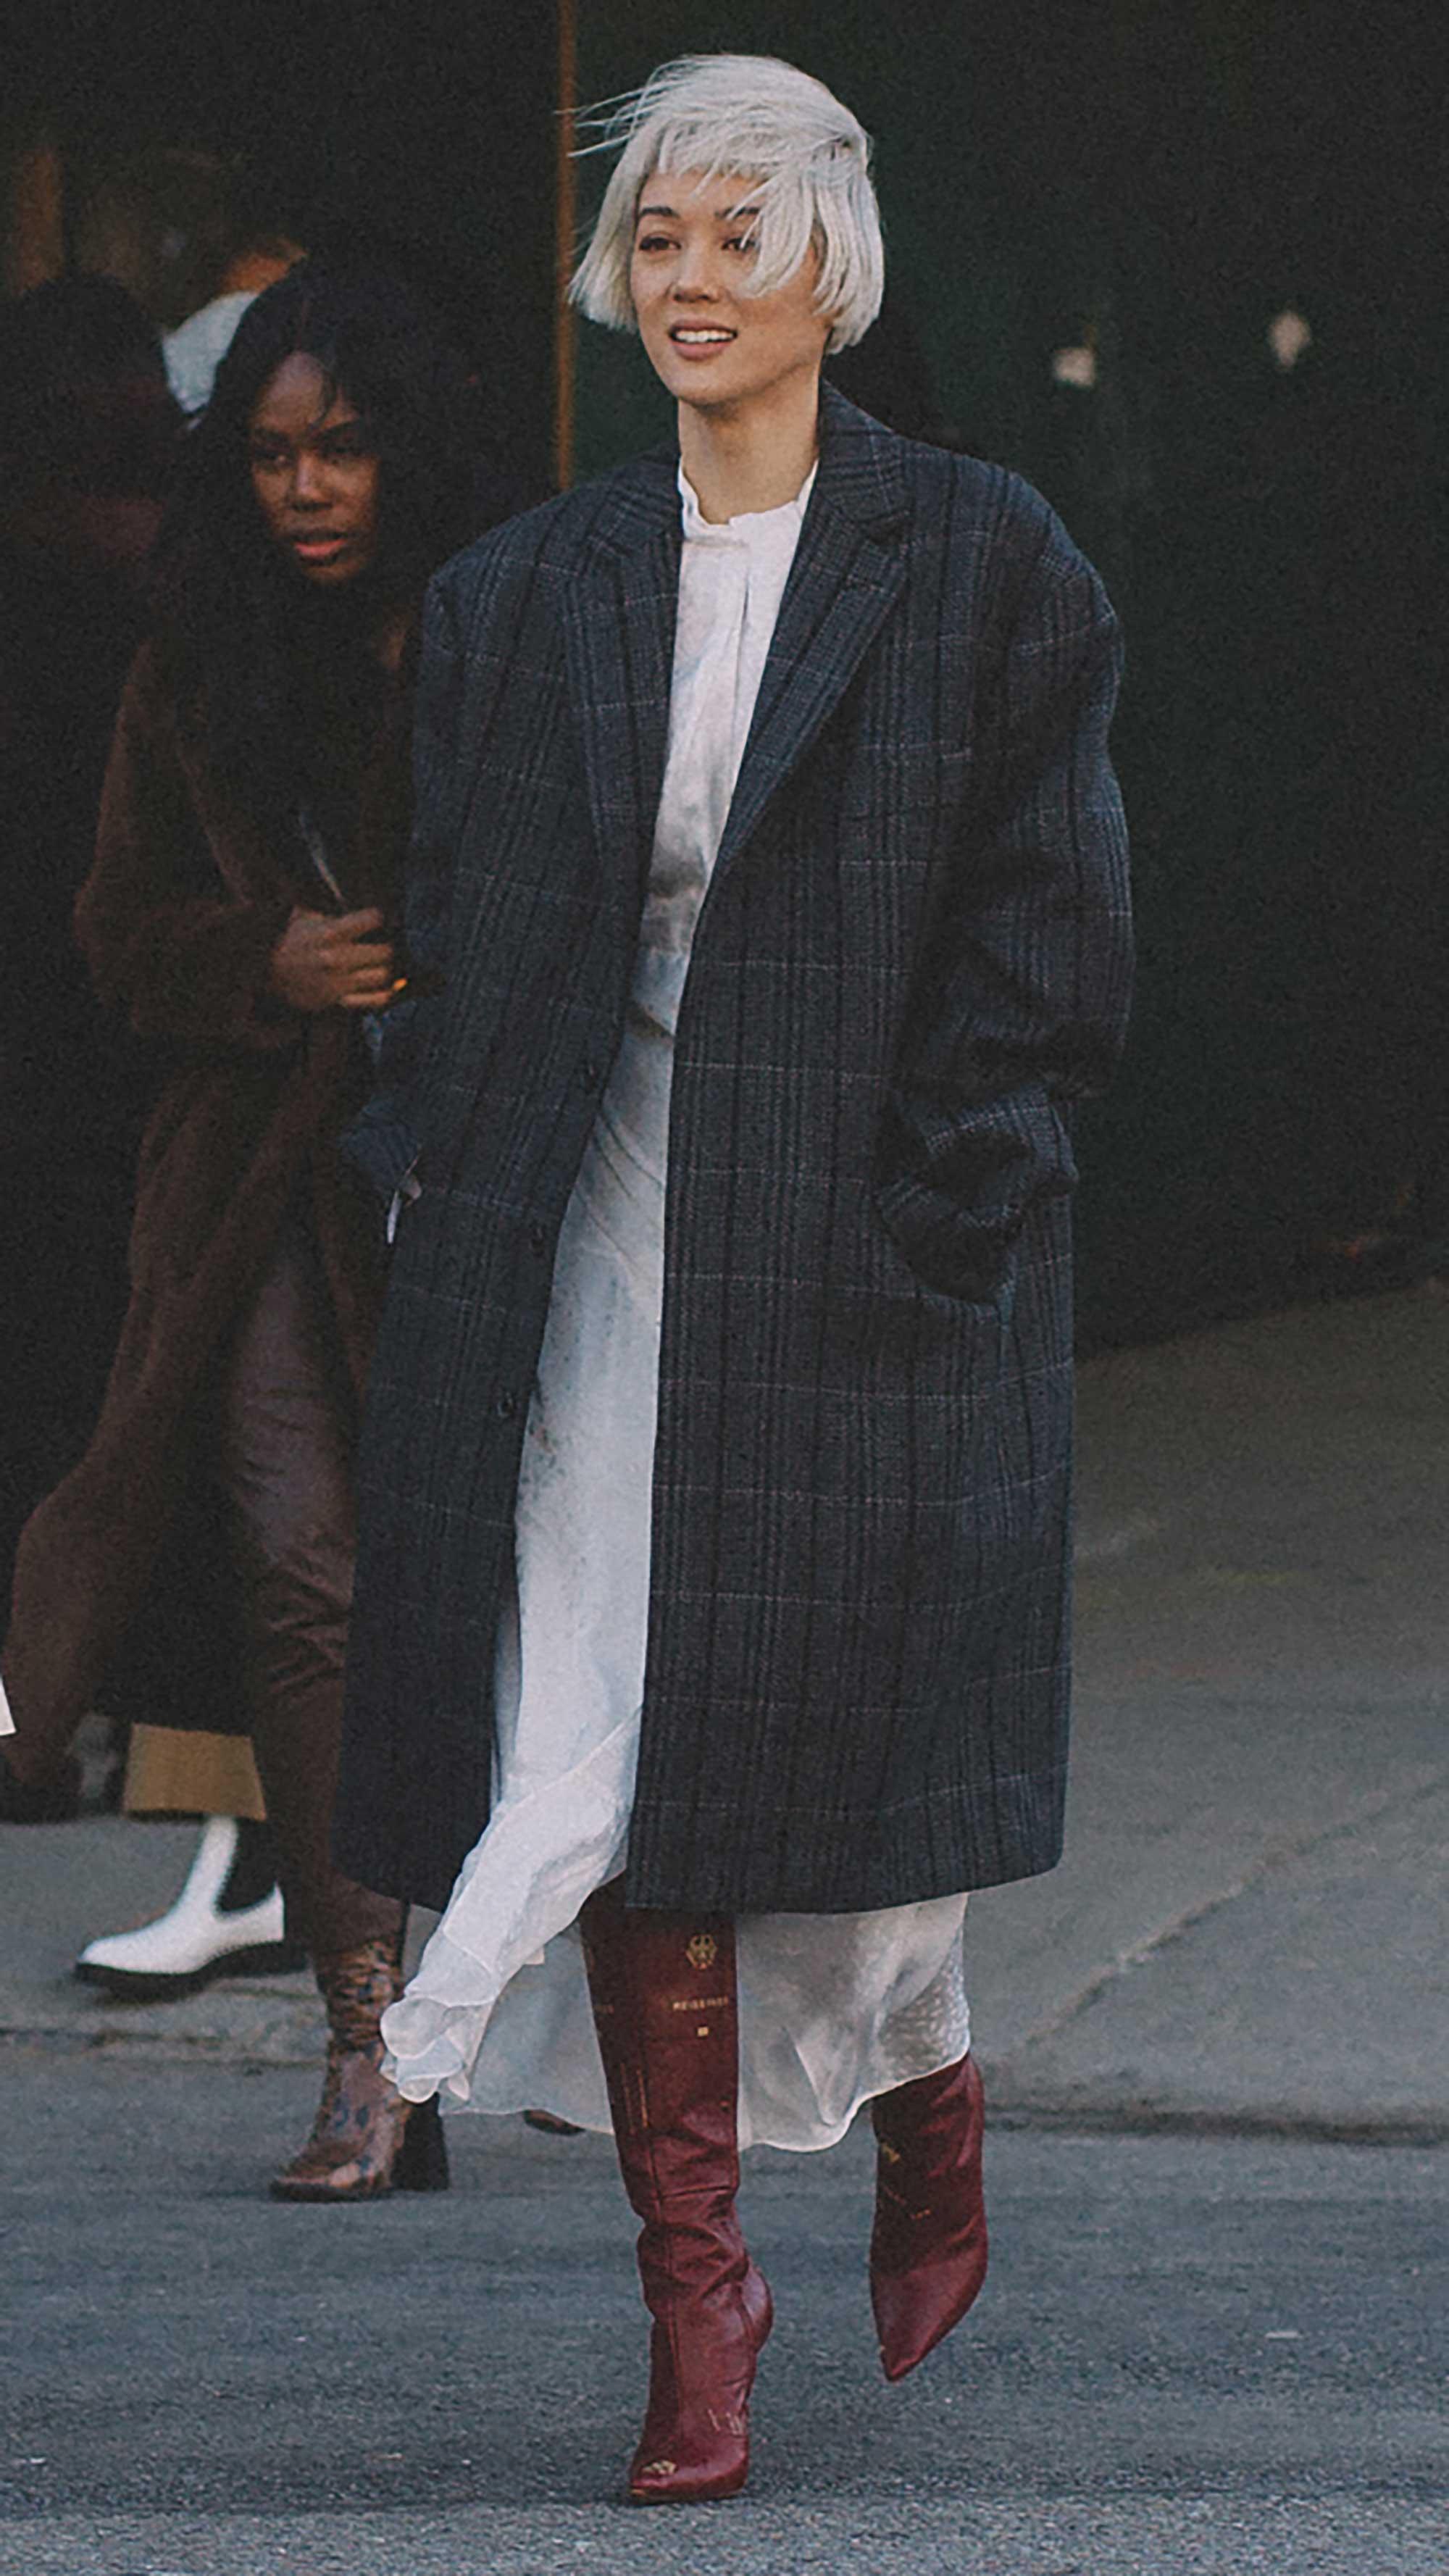 Best outfits of New York Fashion Week street style day three NYFW FW19 - 48.jpg